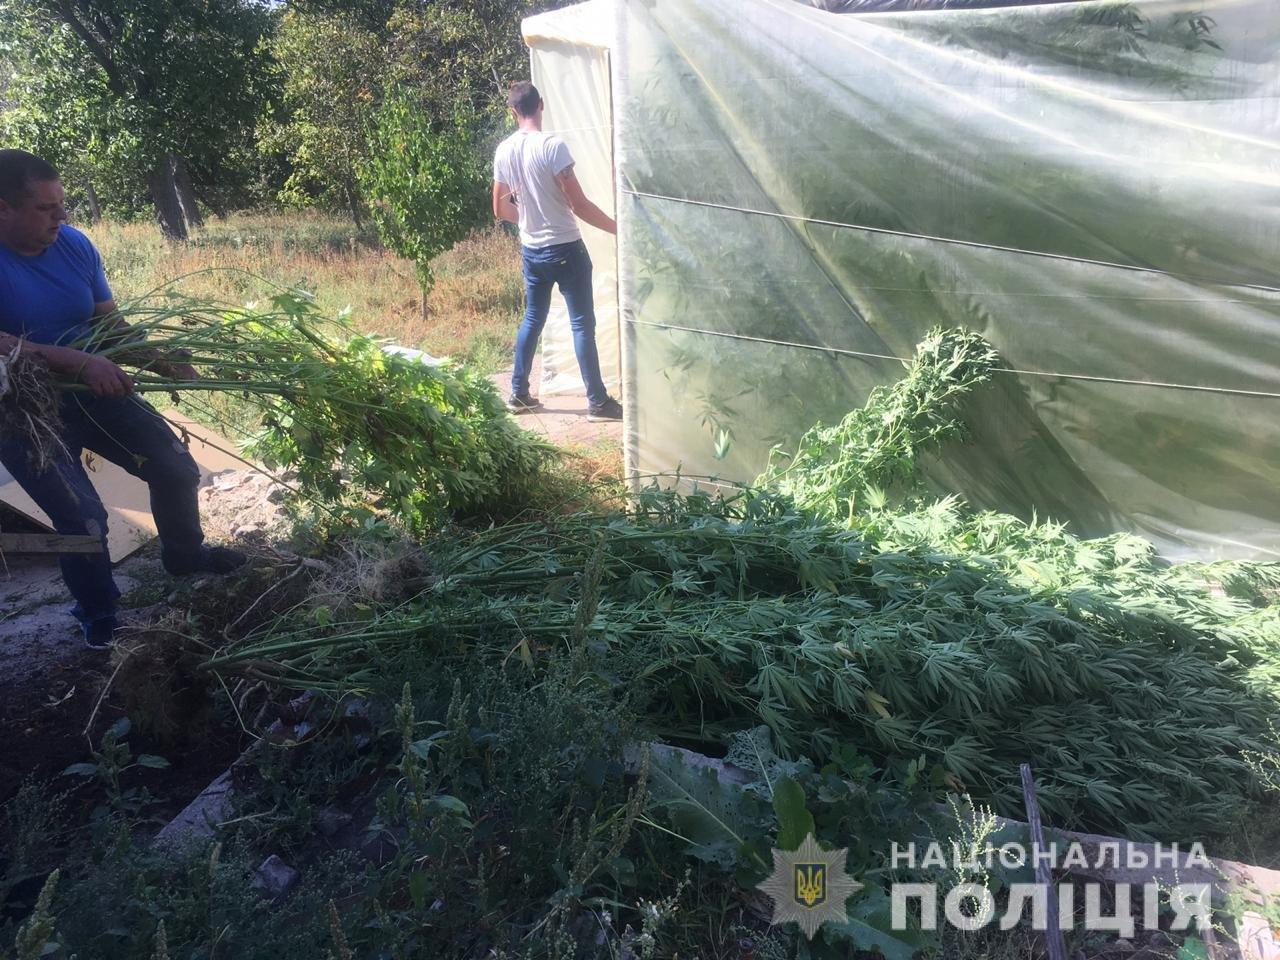 В Днепропетровской области растили трехметровую коноплю, - ФОТО, ВИДЕО, фото-2